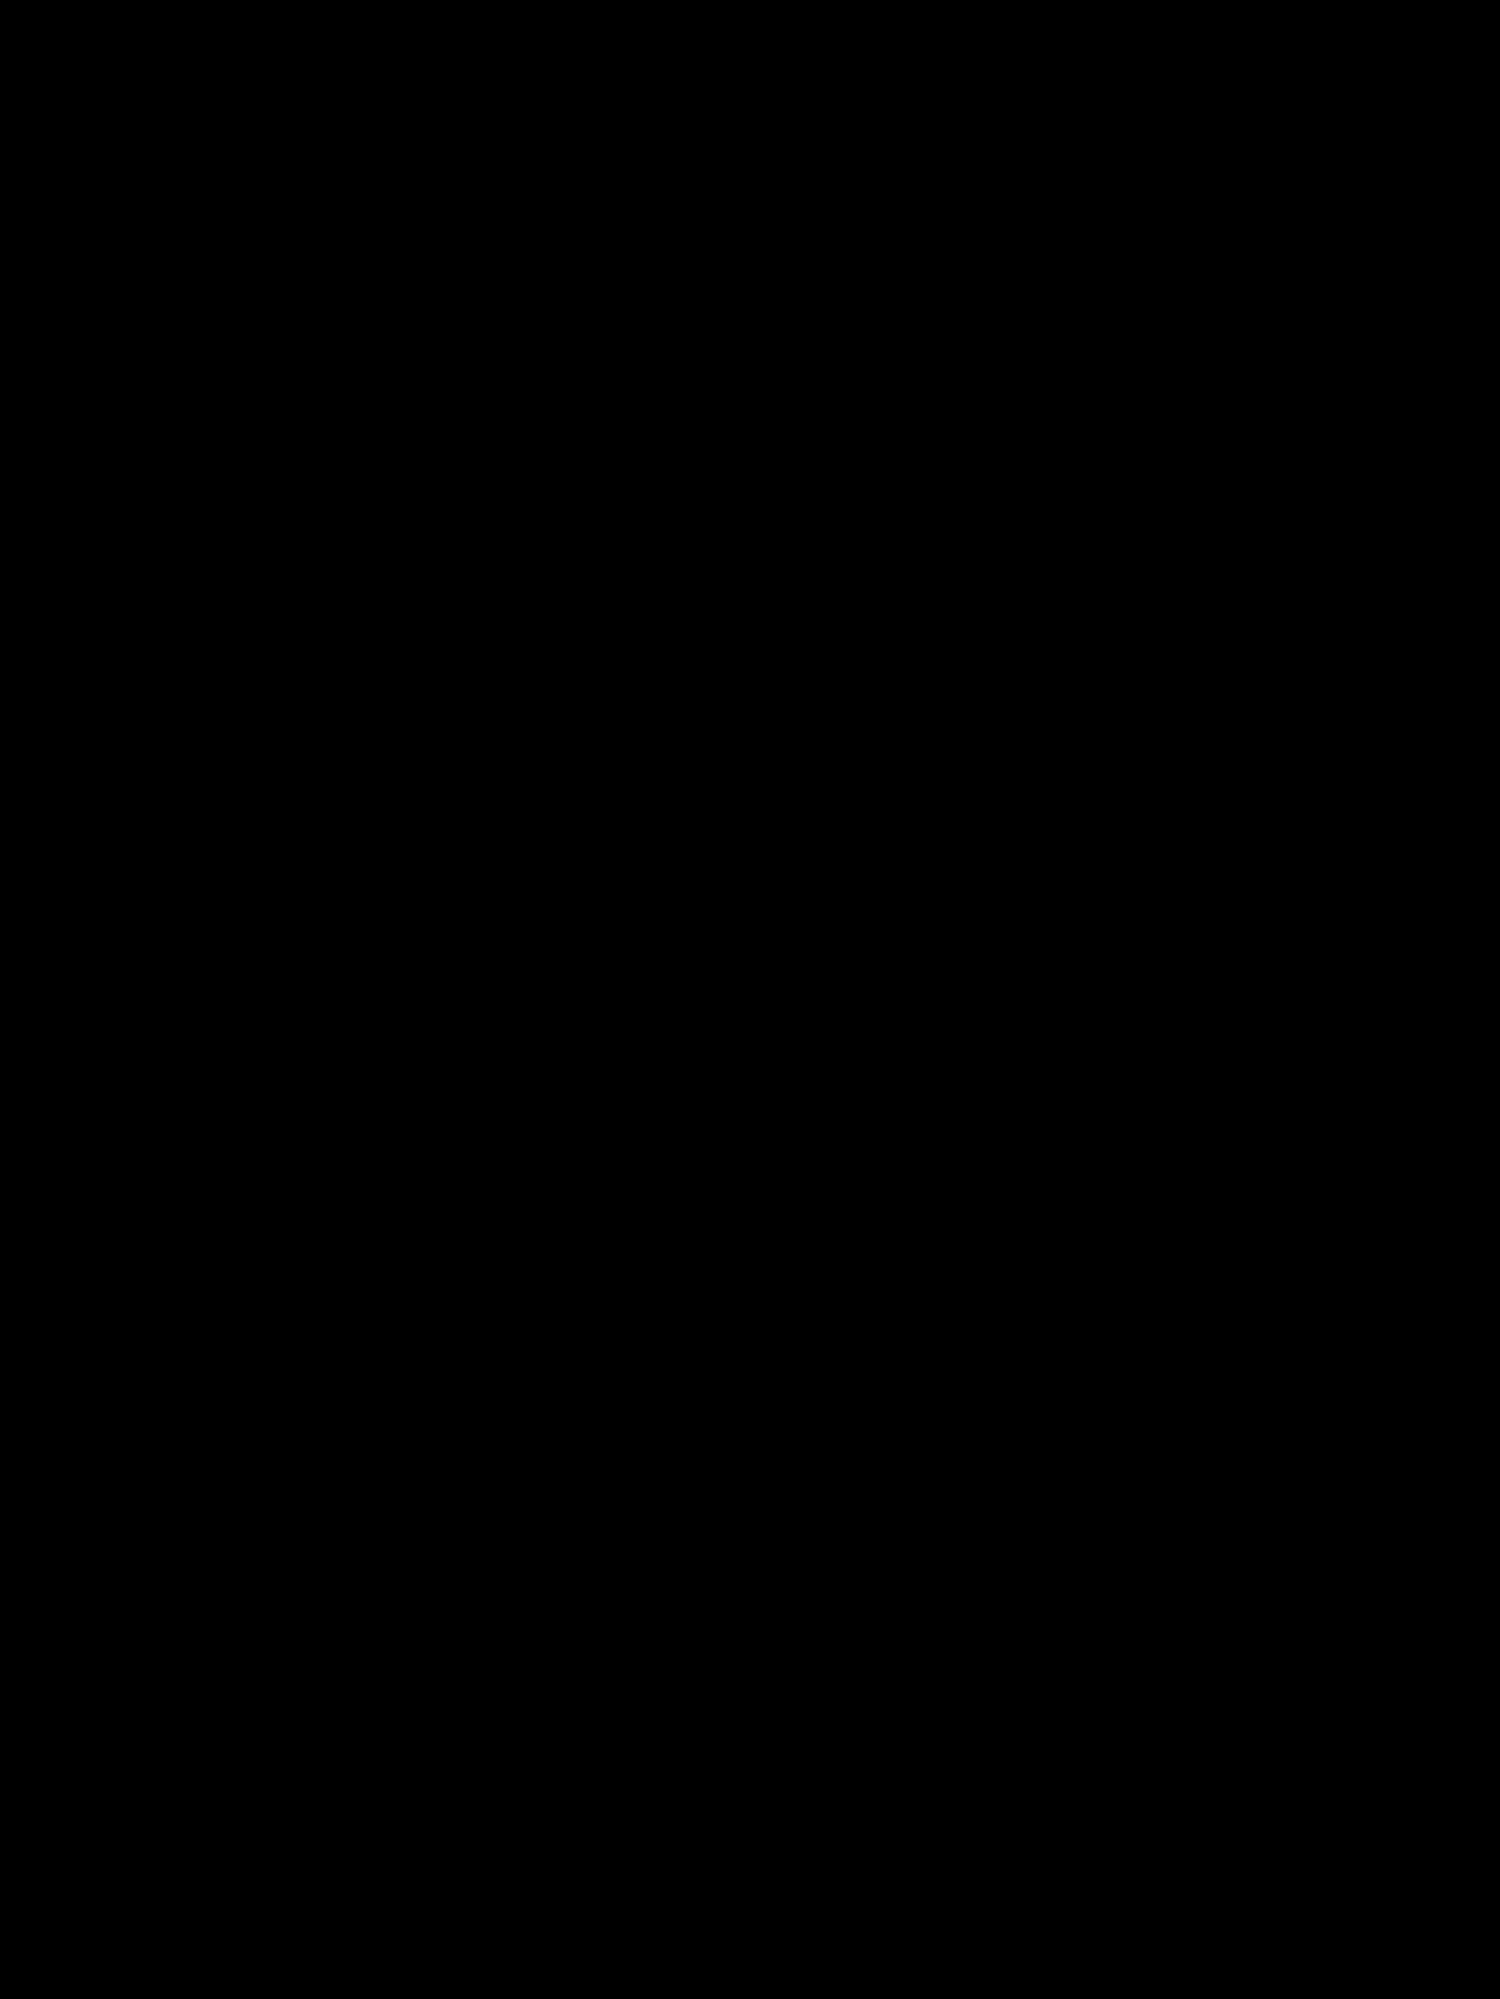 img_4670-2